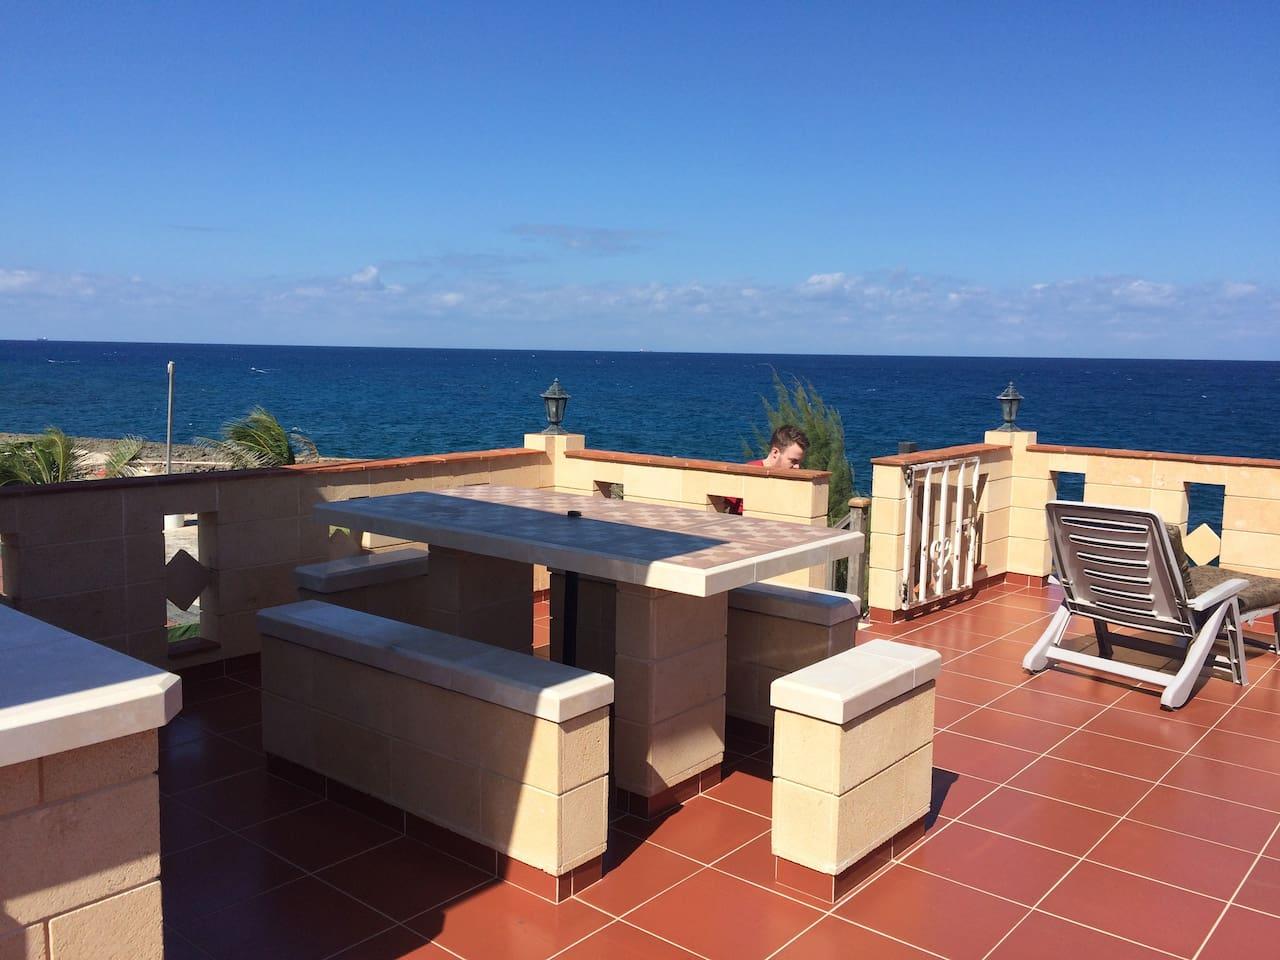 Apartment Casa Oceanview 1 - Luxury   Amazing View photo 23408915